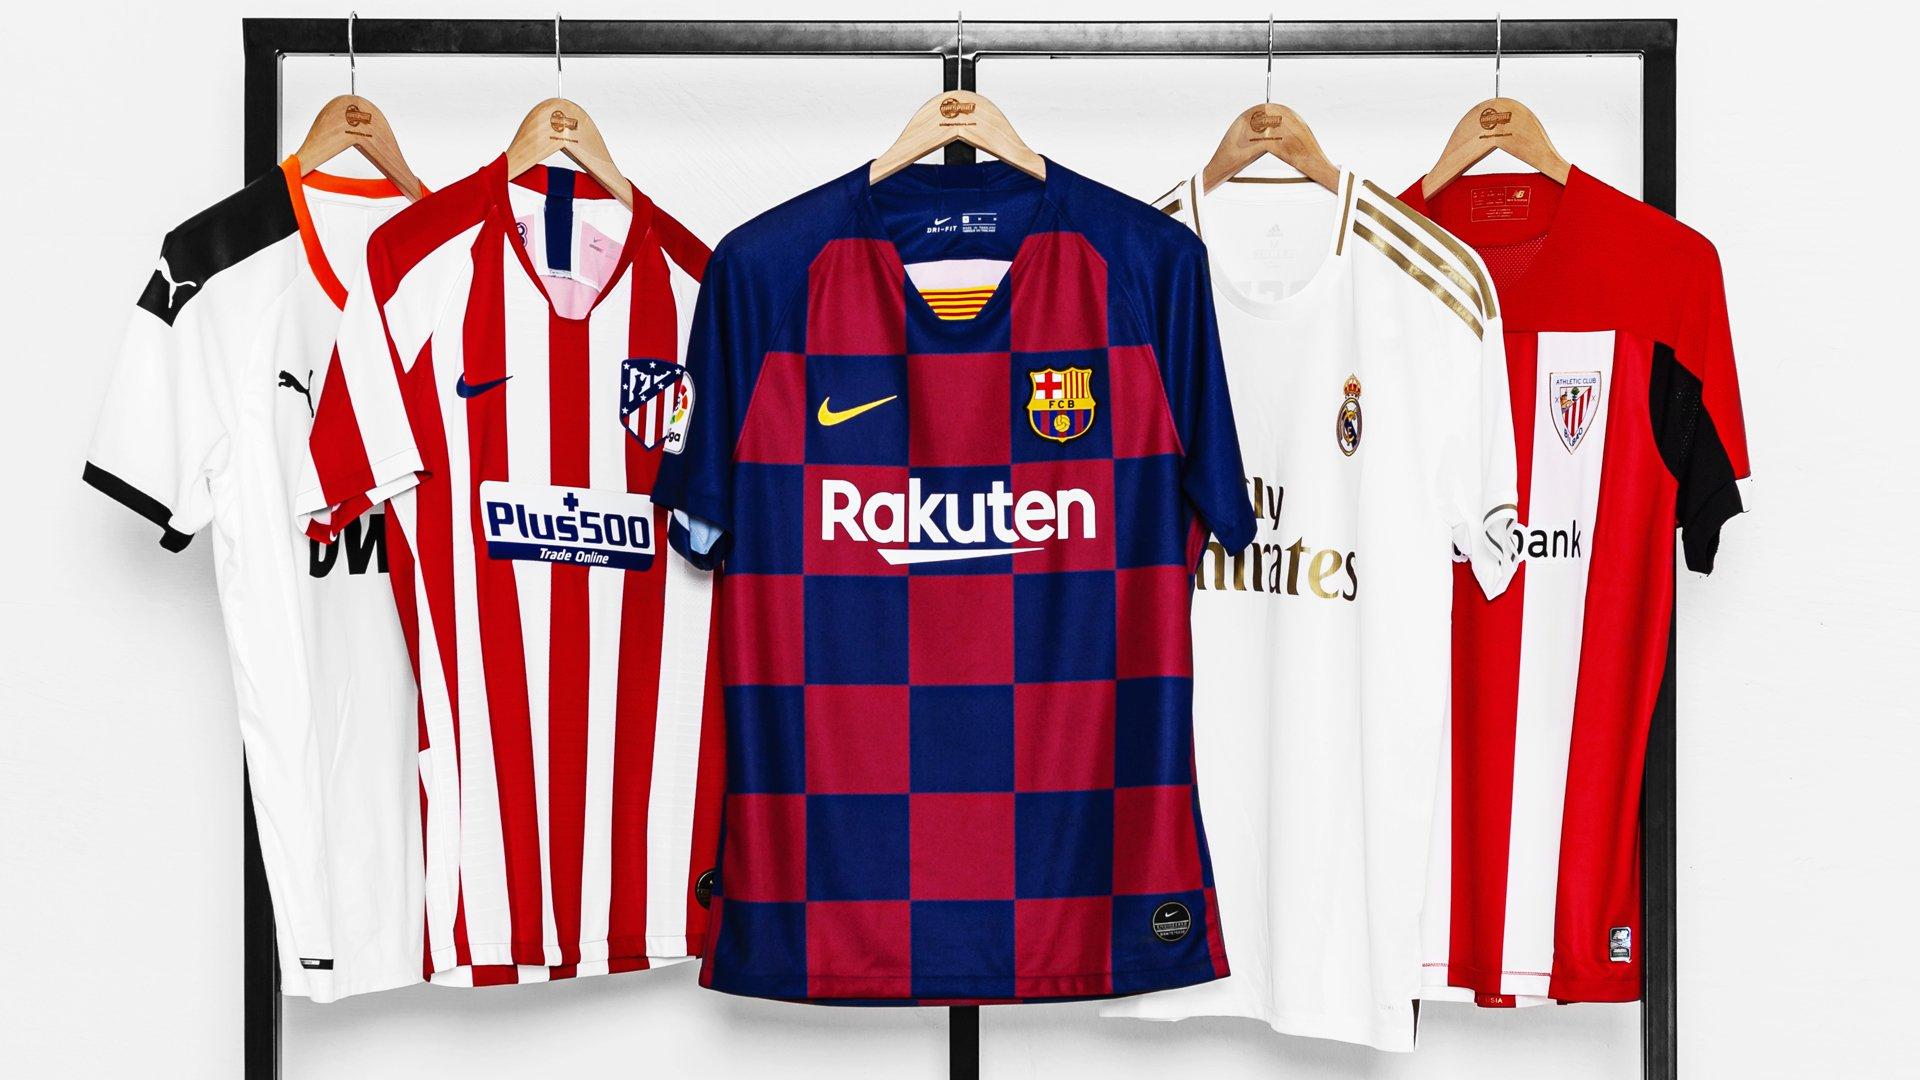 finest selection 49927 c5e16 La Liga kits 2019/20 | See all the new La Liga kits at ...